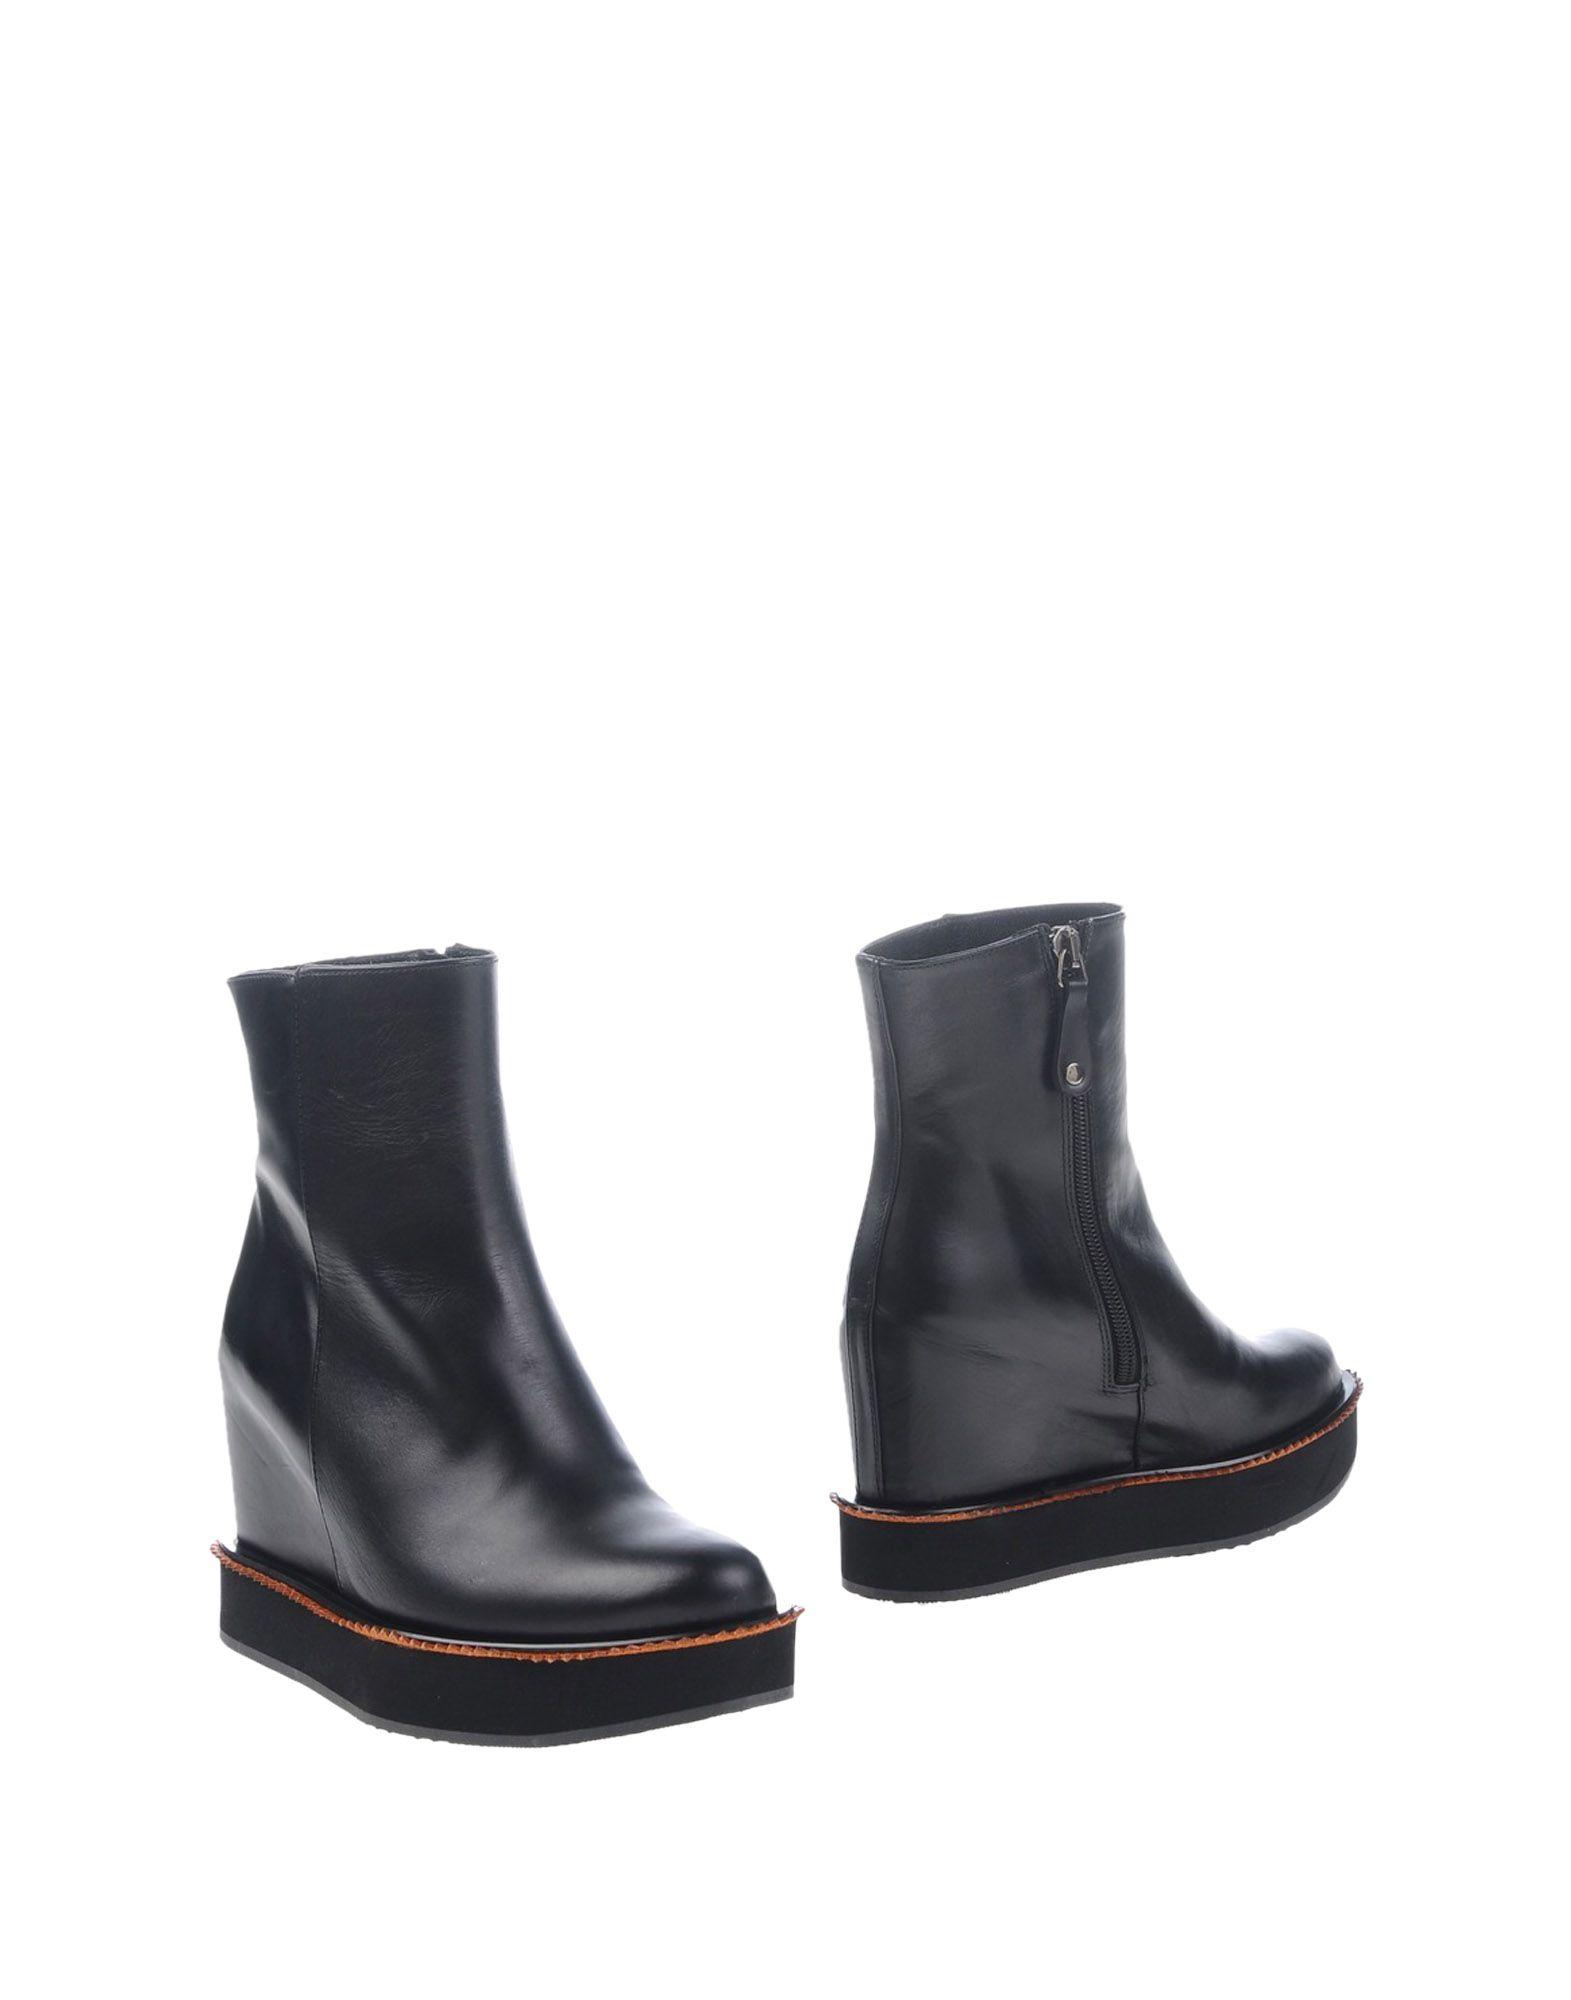 Stilvolle billige Schuhe Damen Paloma Barceló Stiefelette Damen Schuhe  11224238EW c15658